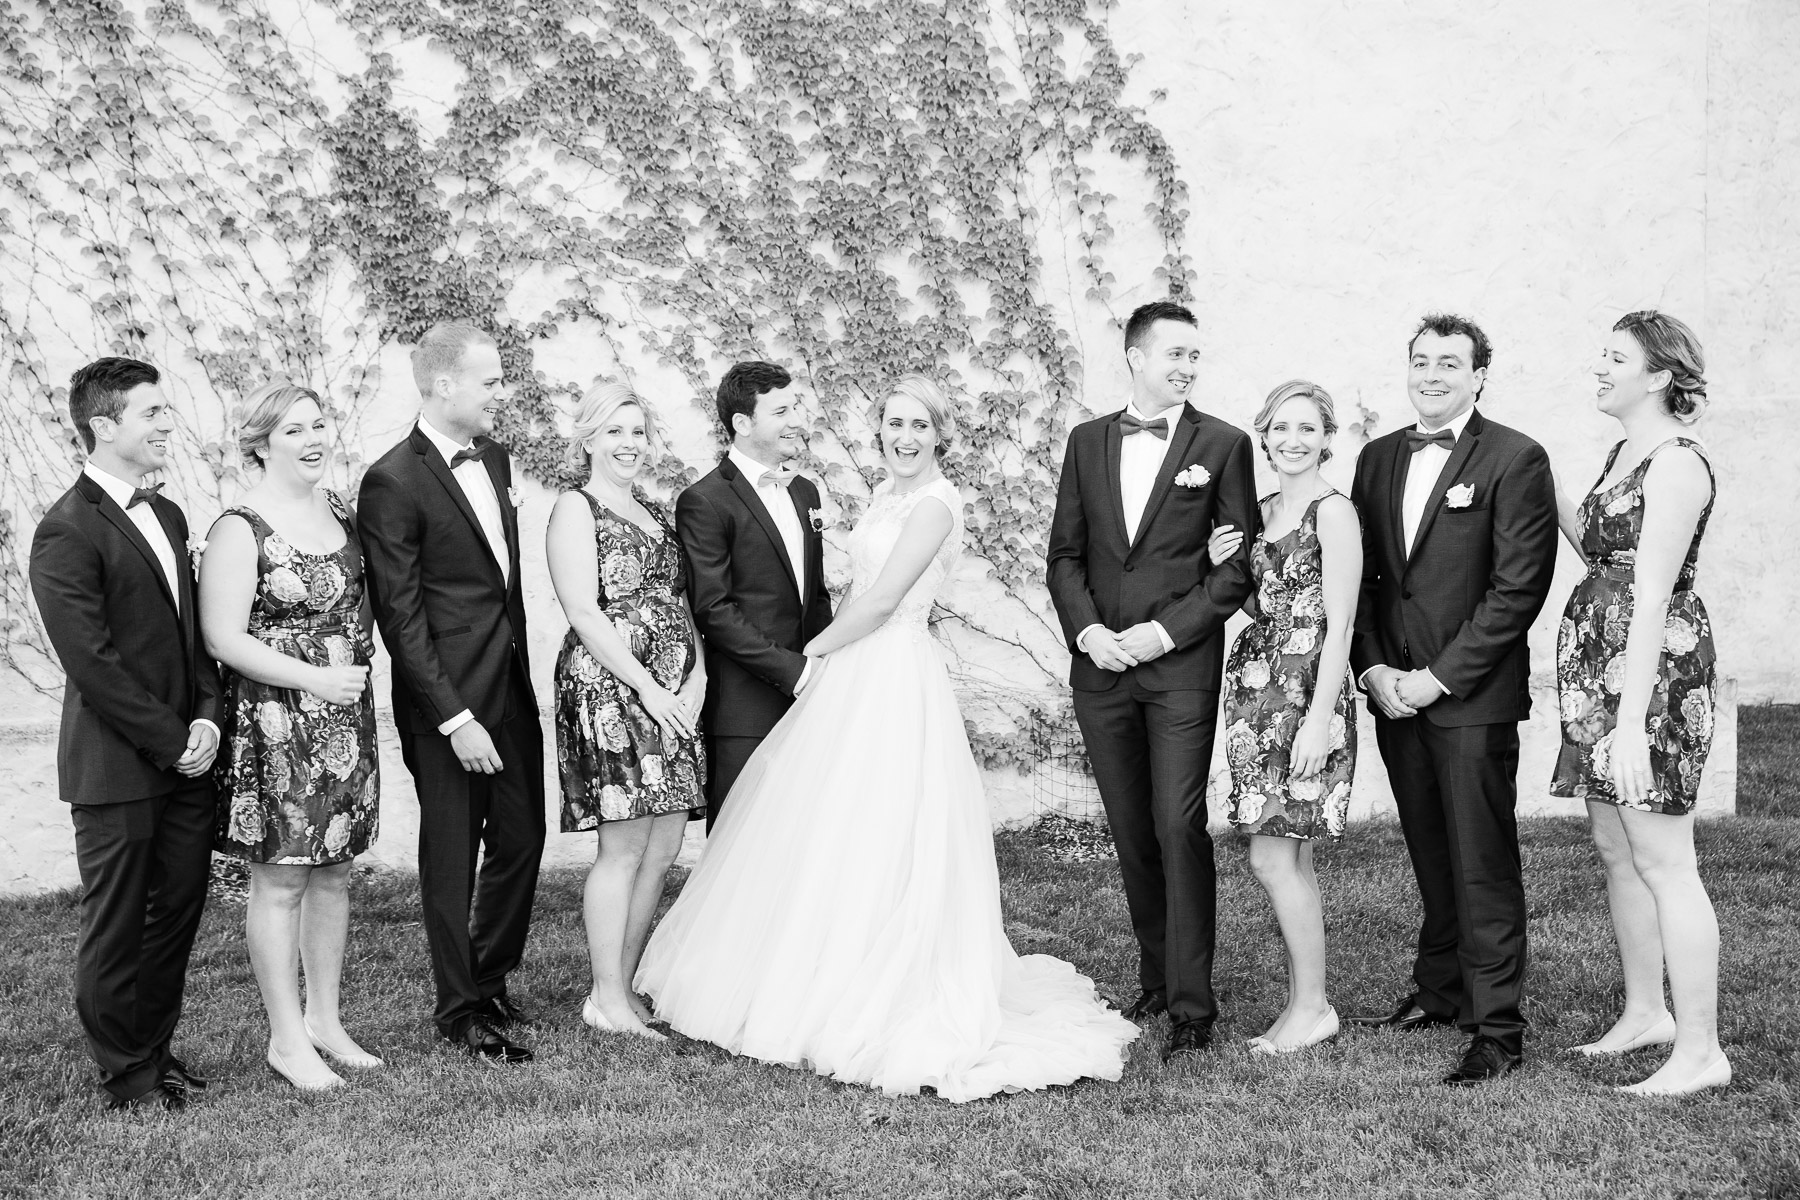 Marnie_and_Charlie_Yarra_Valley_Wedding_Blog-78.jpg